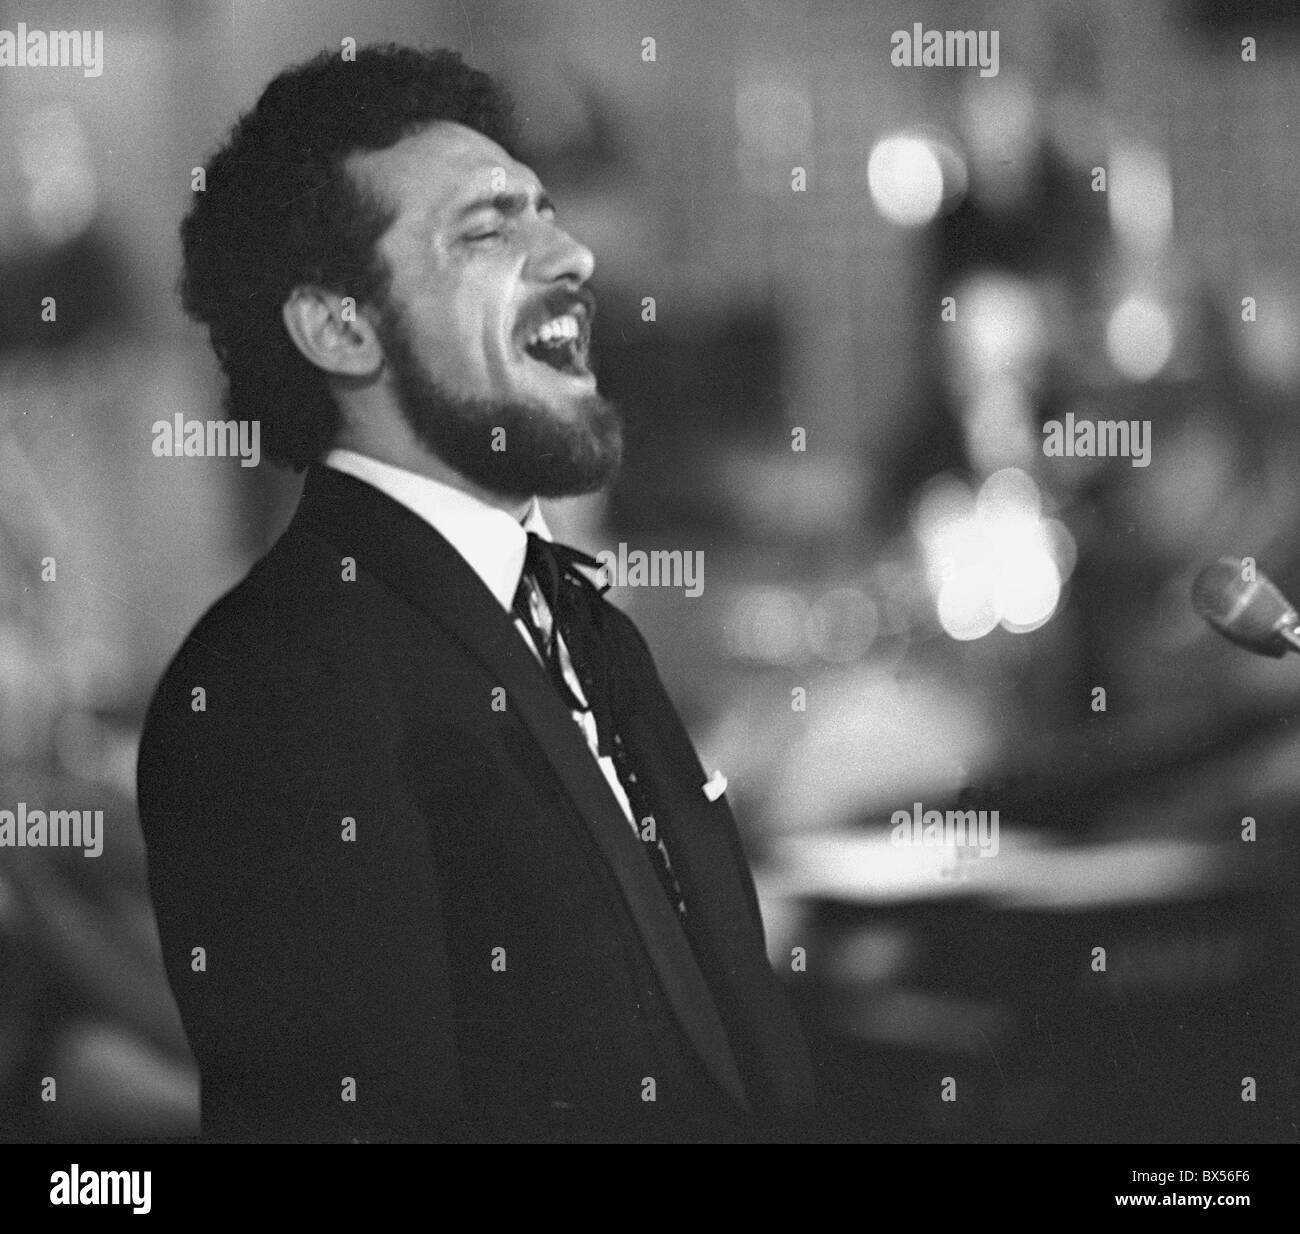 Popular singer Waldemar Matuska. Prague, Czechoslovakia 1965. CTK Photo / Zdenek Havelka) - Stock Image